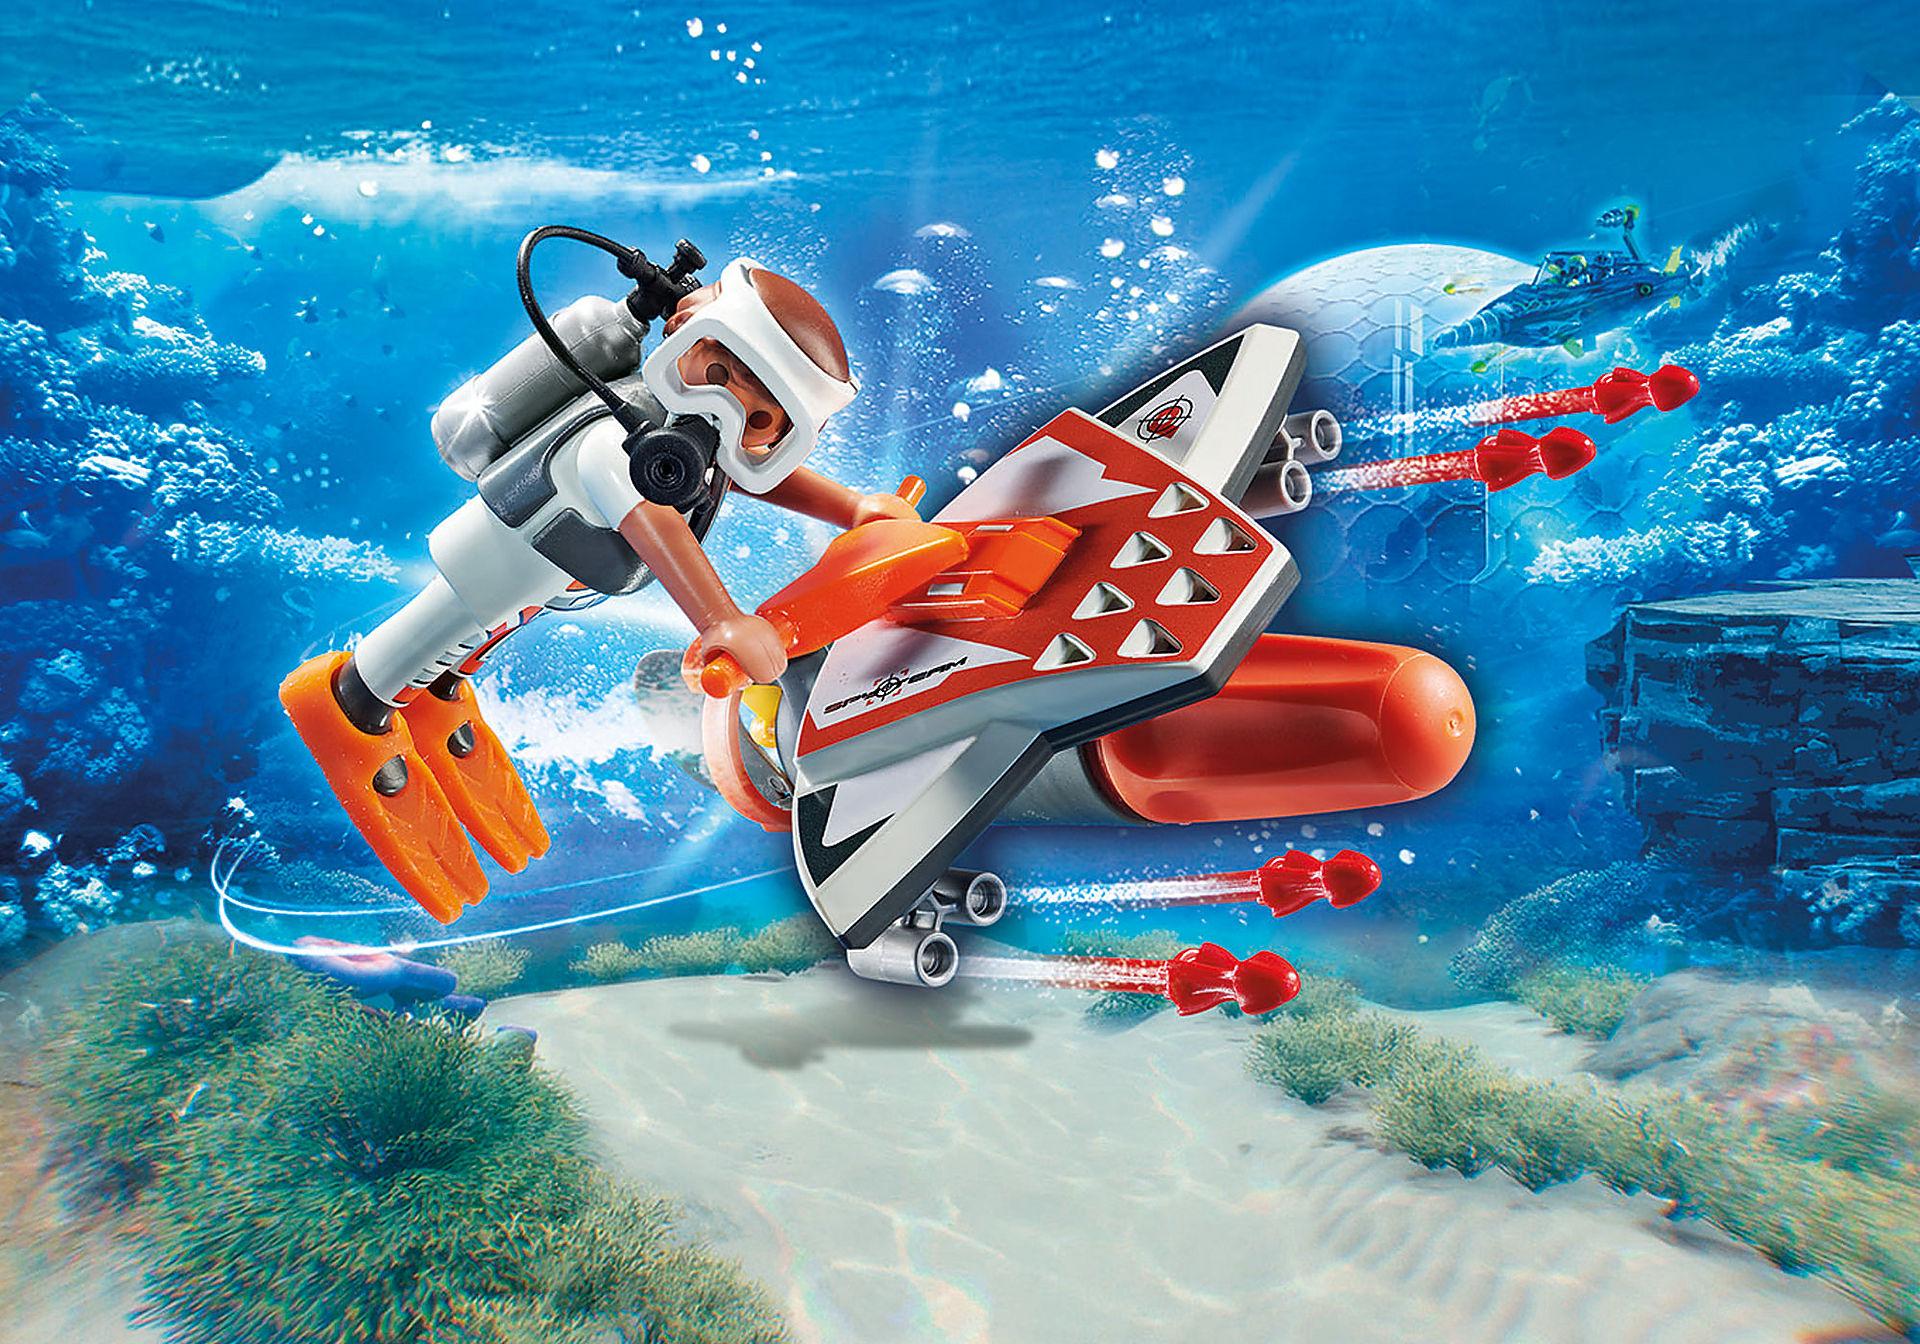 70004 Propulseur sous-marin Spy Team zoom image1